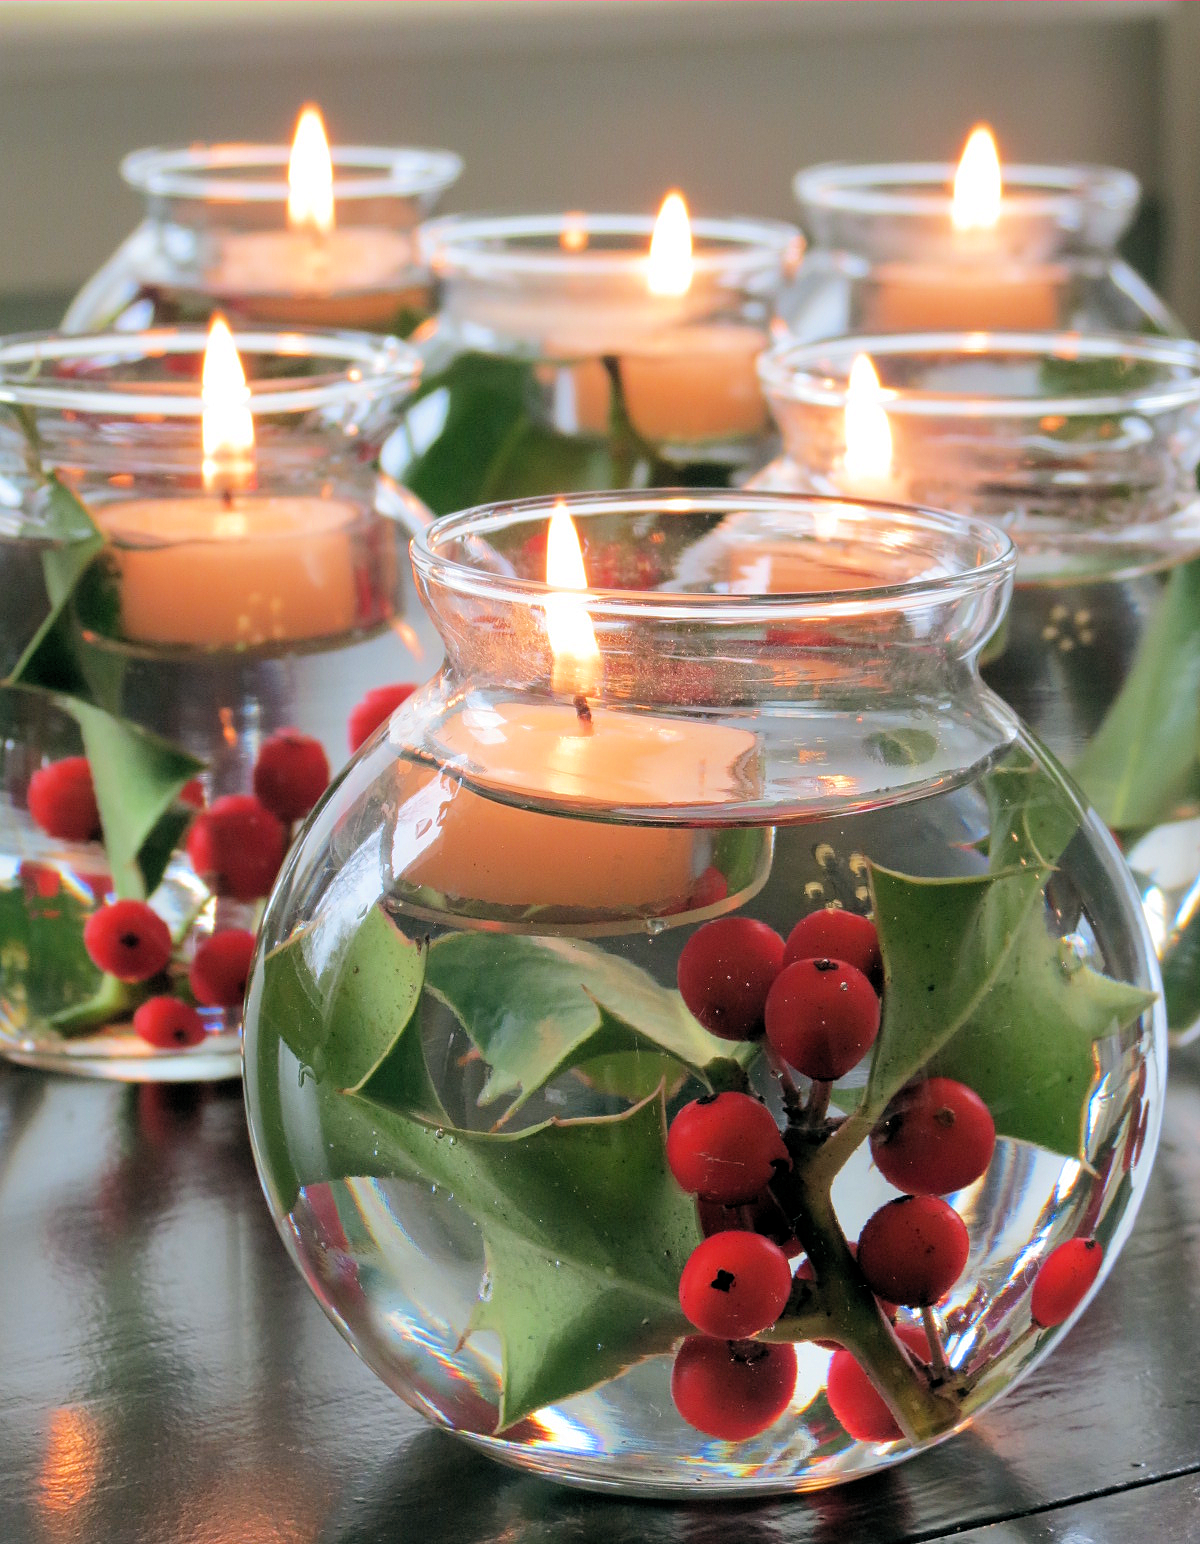 DIY Beautiful Floating Candles Thewowdecor